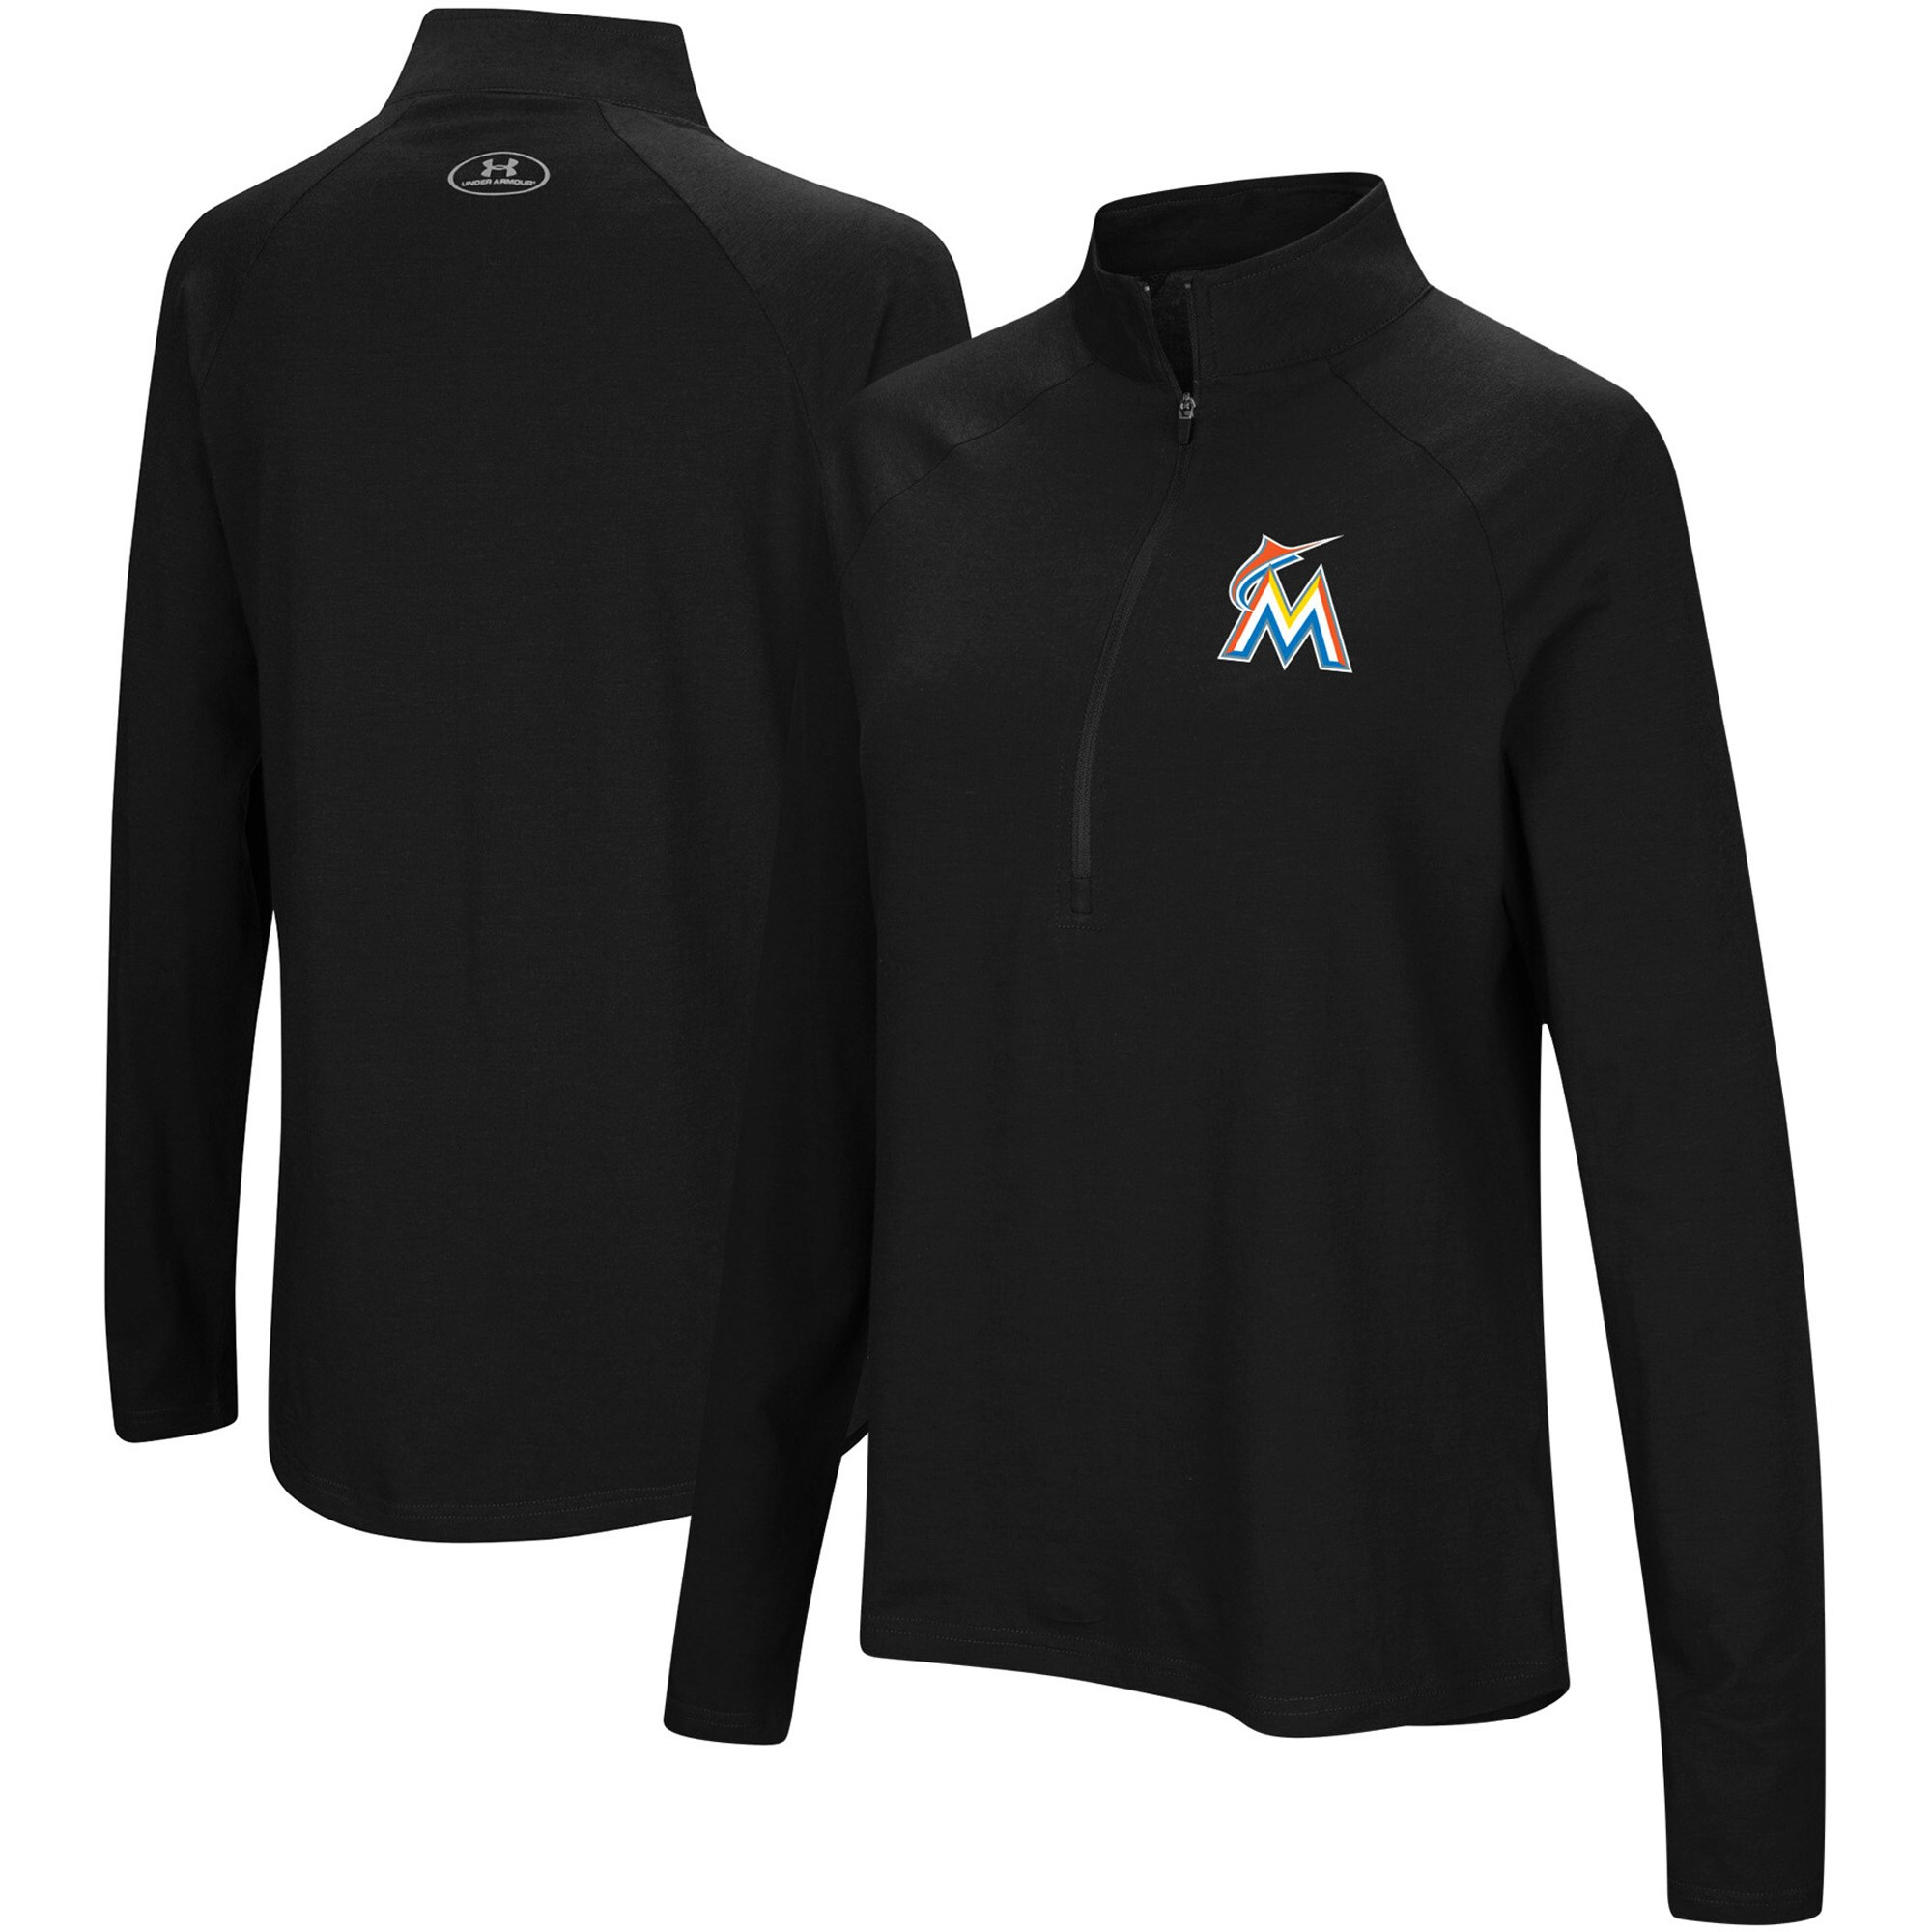 Miami Marlins Under Armour Women's Passion Performance Tri-Blend Raglan Half-Zip Pullover Jacket - Black